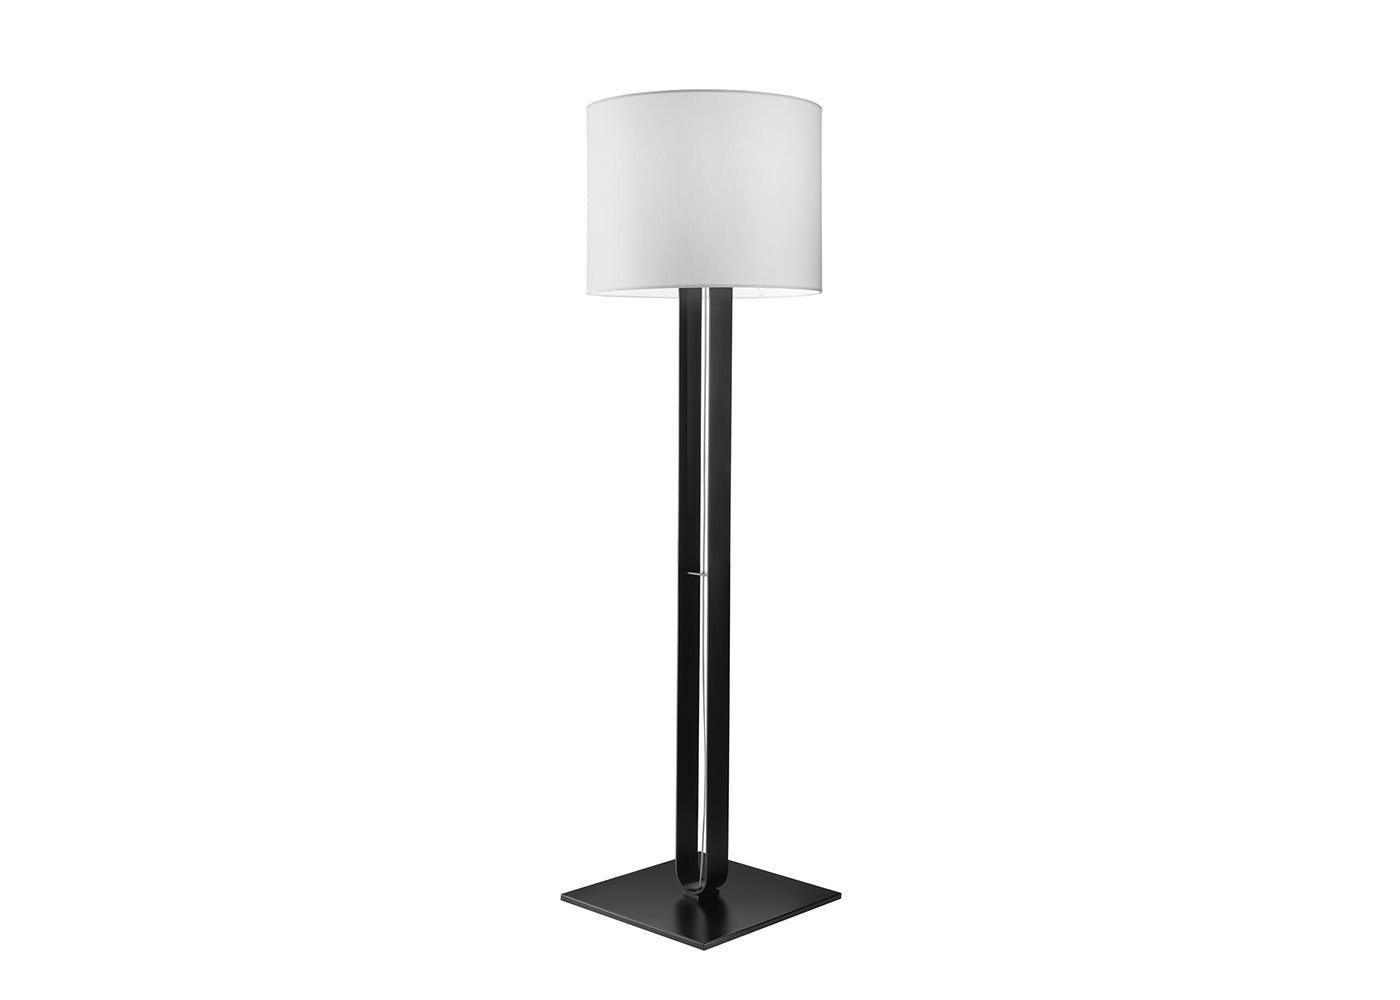 U Turn Floor lamp - Angle View